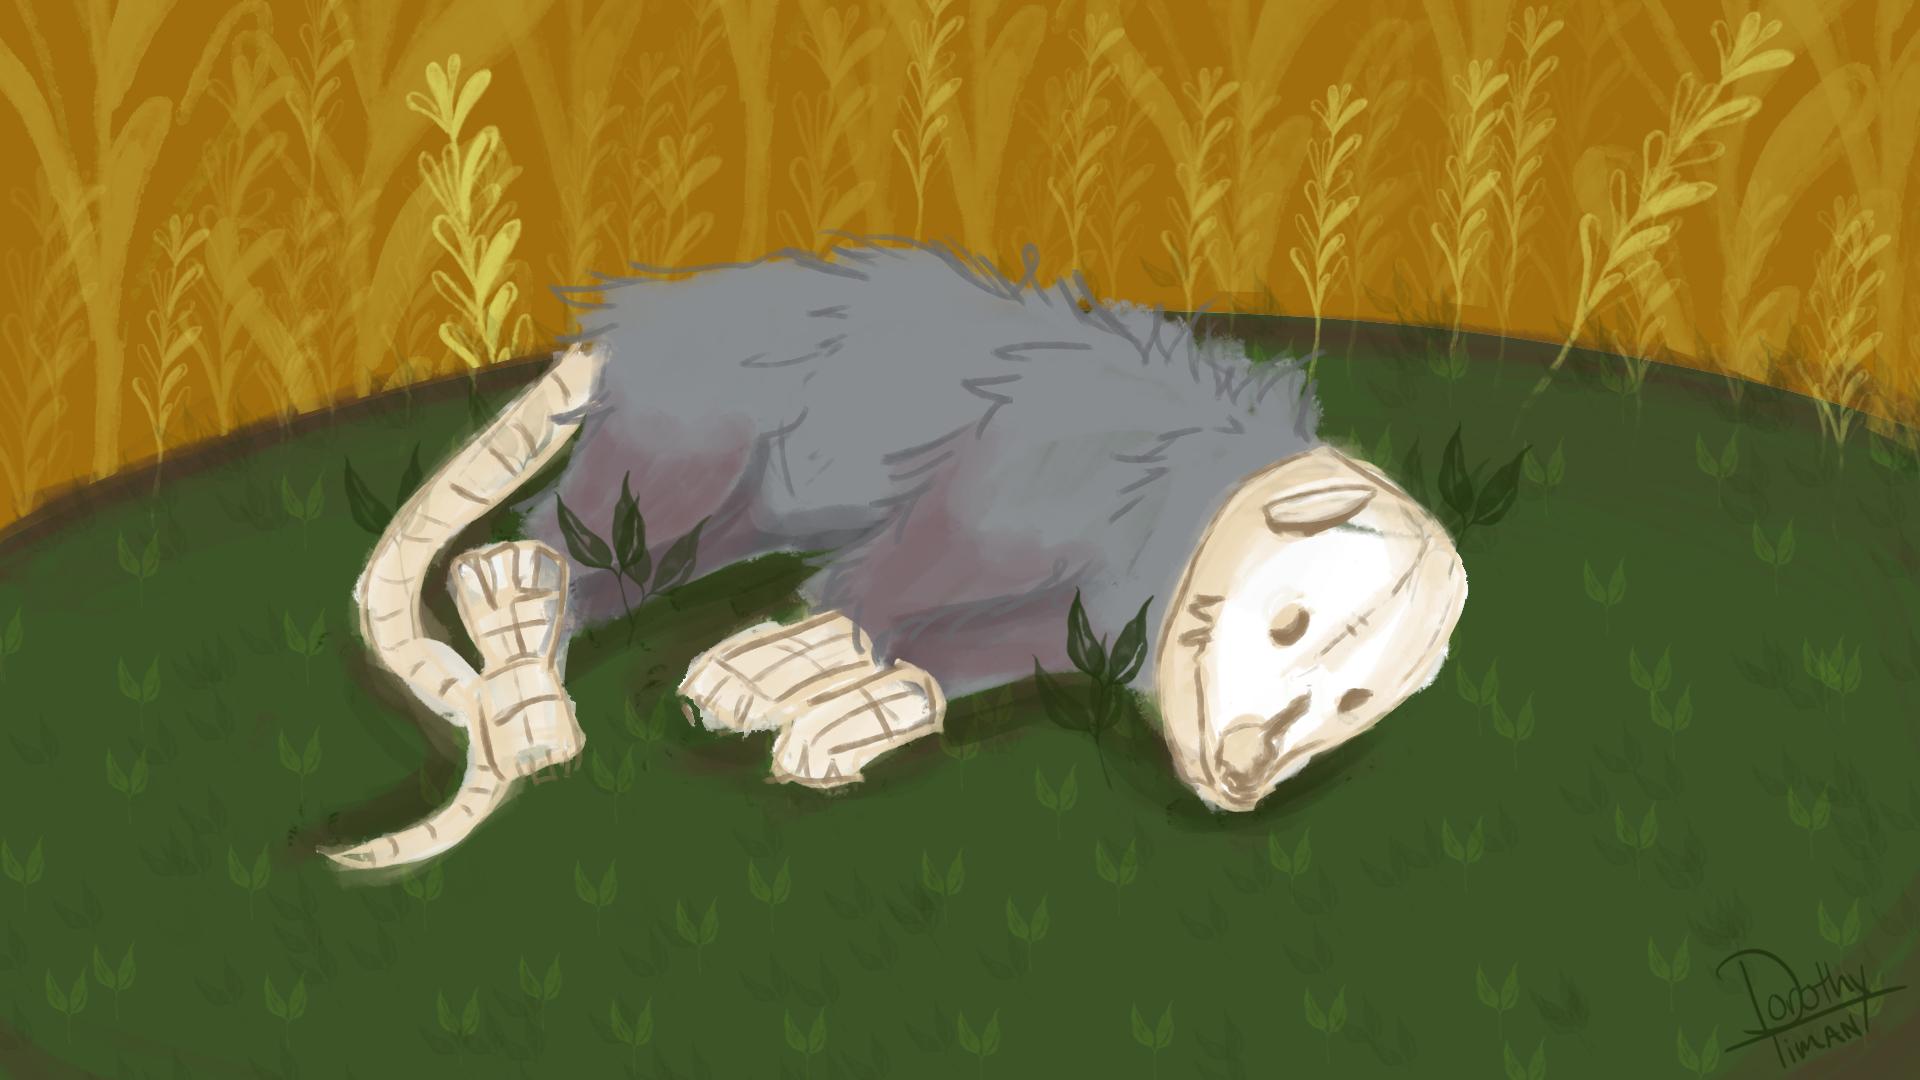 The Possum Skinner - Work in Progress